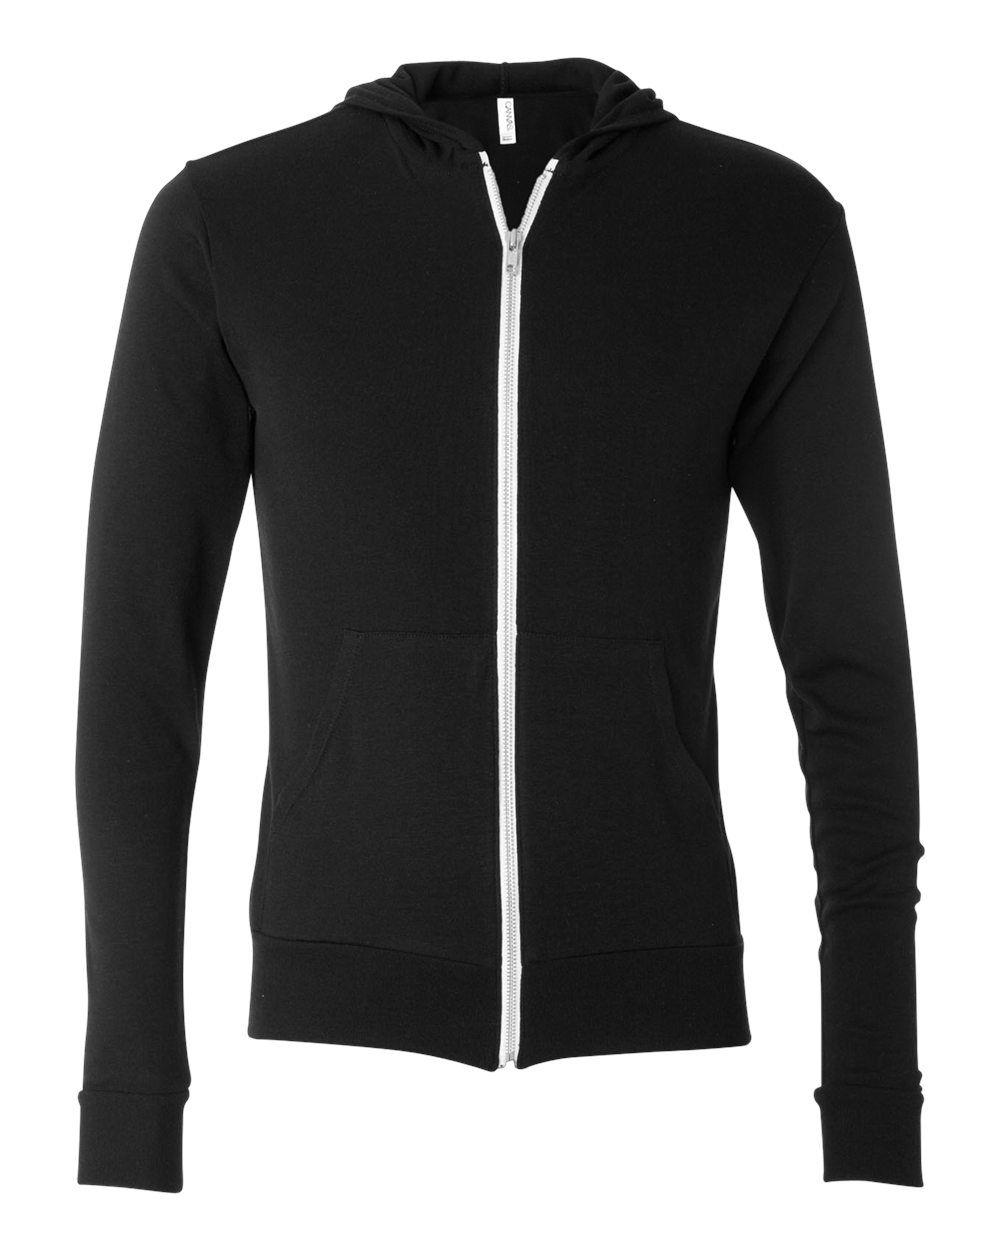 0bbbd6c82b96 Wholesale Hooded Sweatshirts Bulk - DREAMWORKS